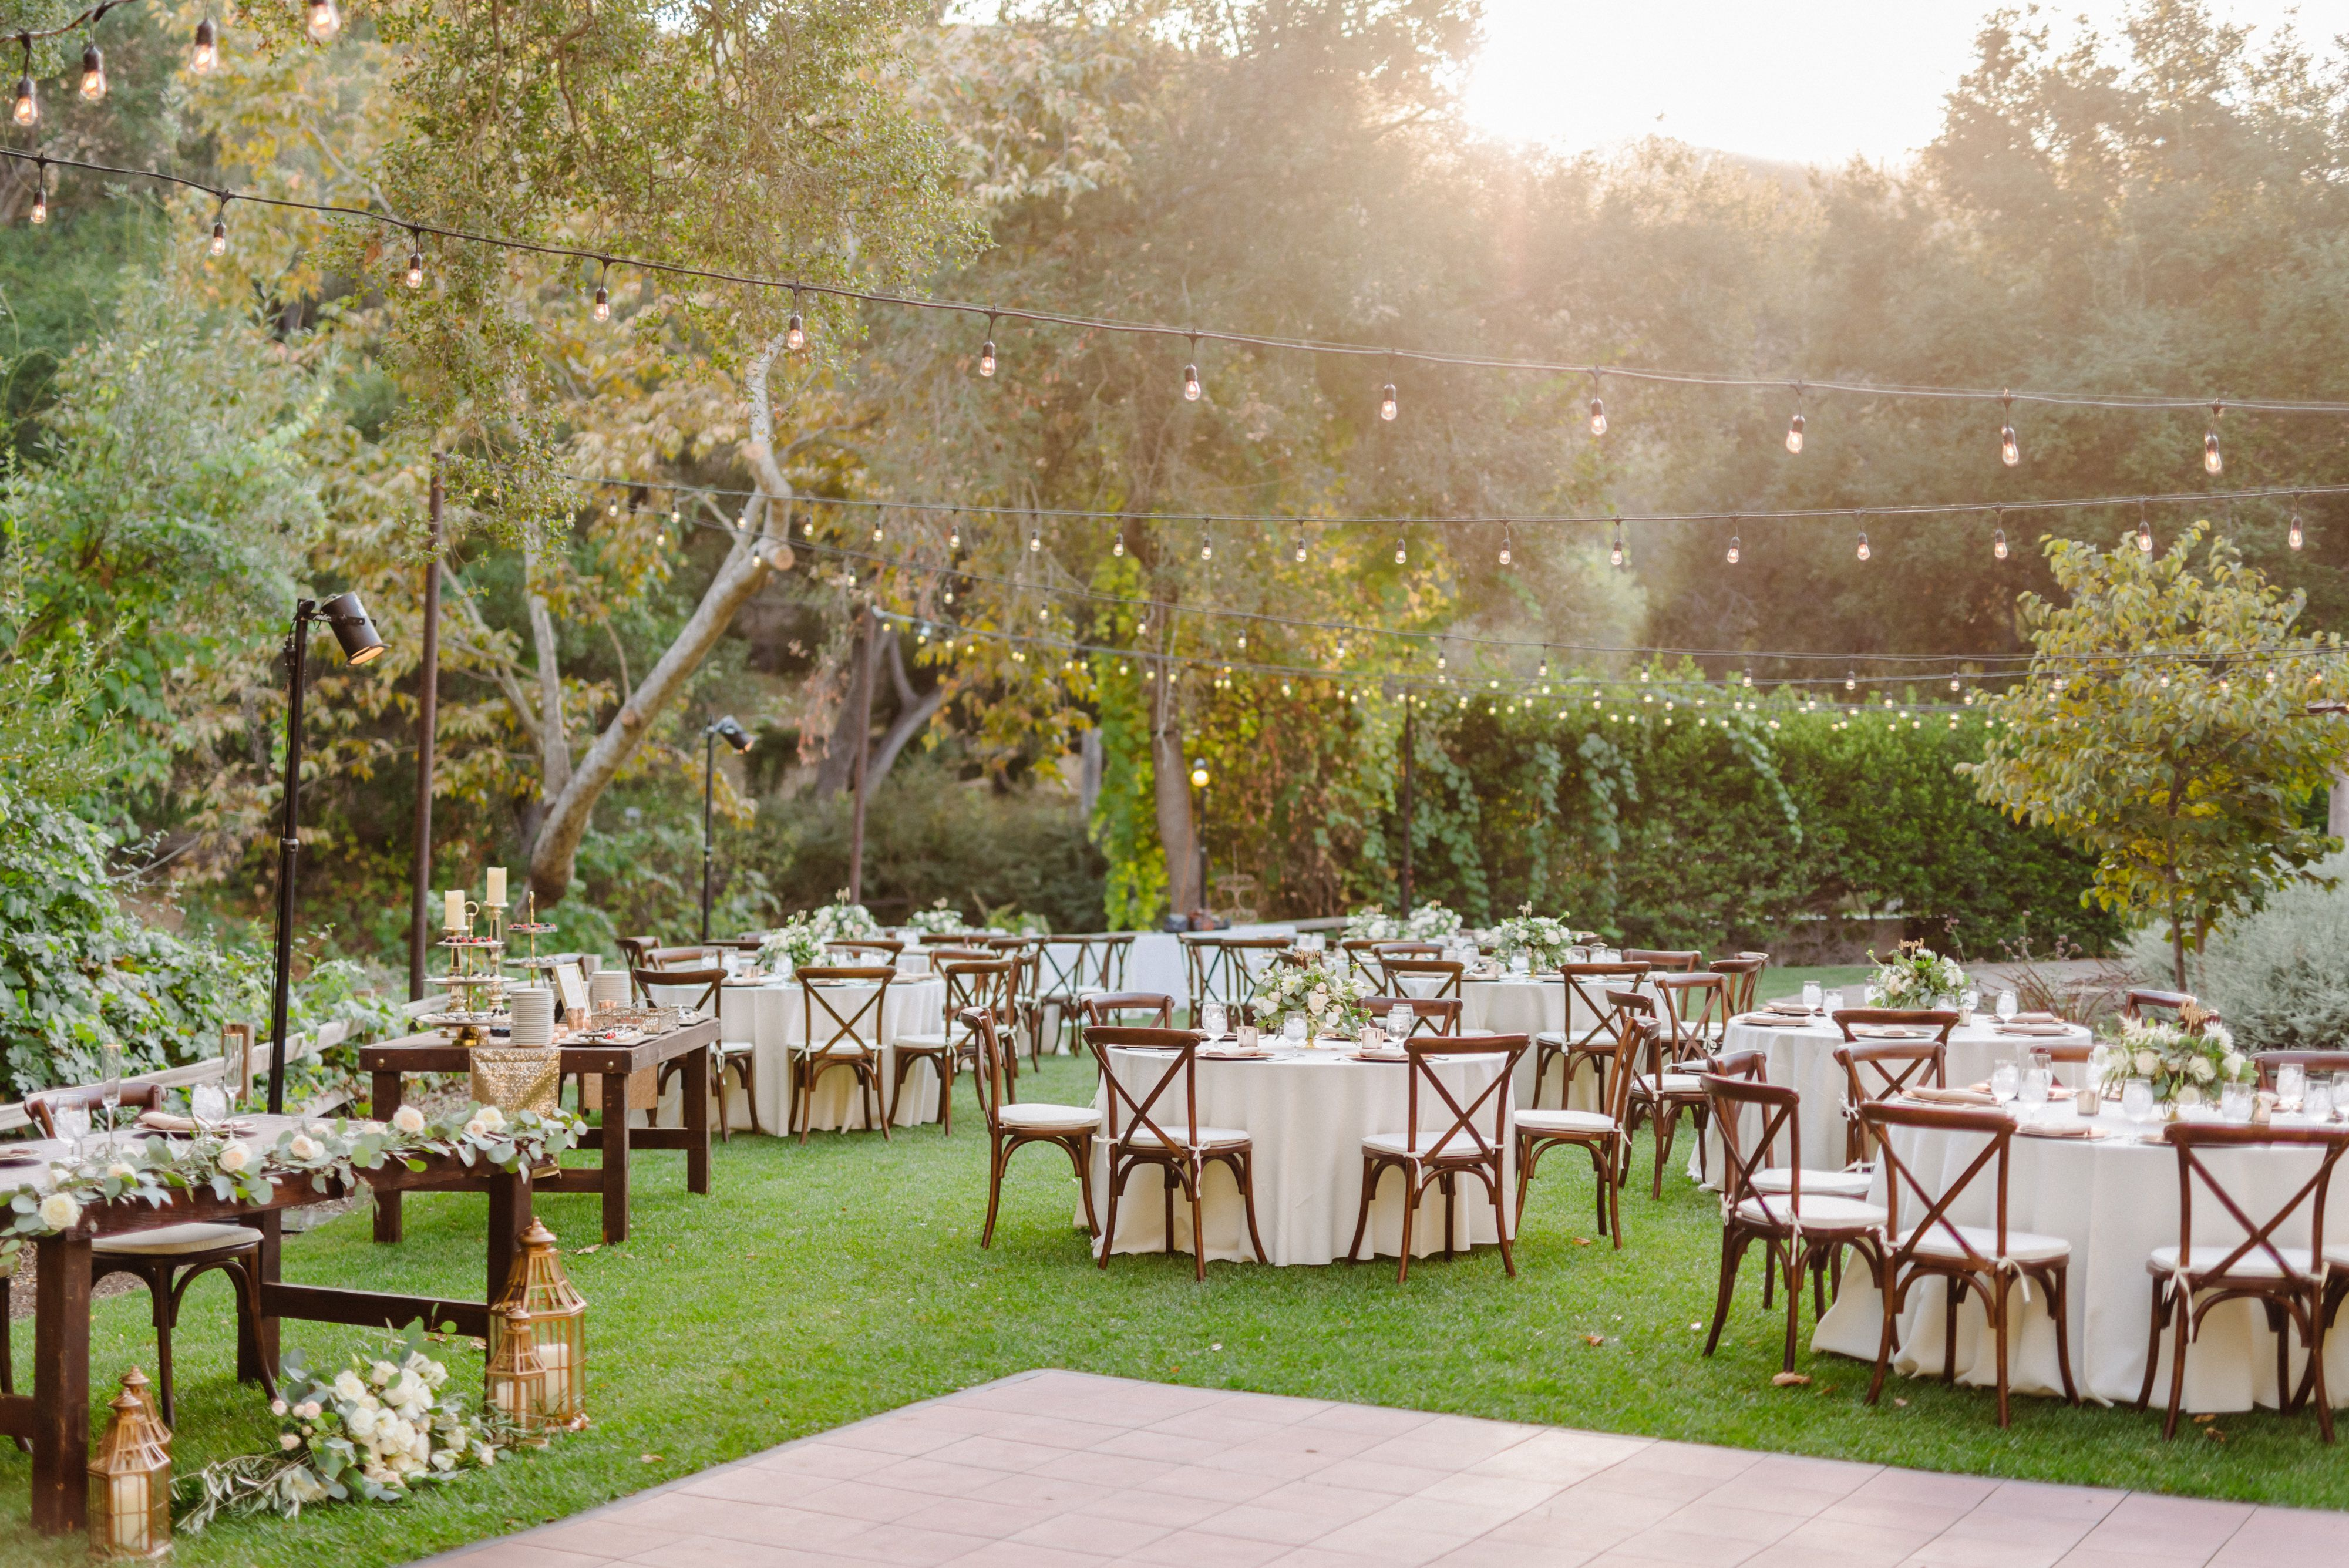 Spectacular setting for a garden reception! | San diego ...